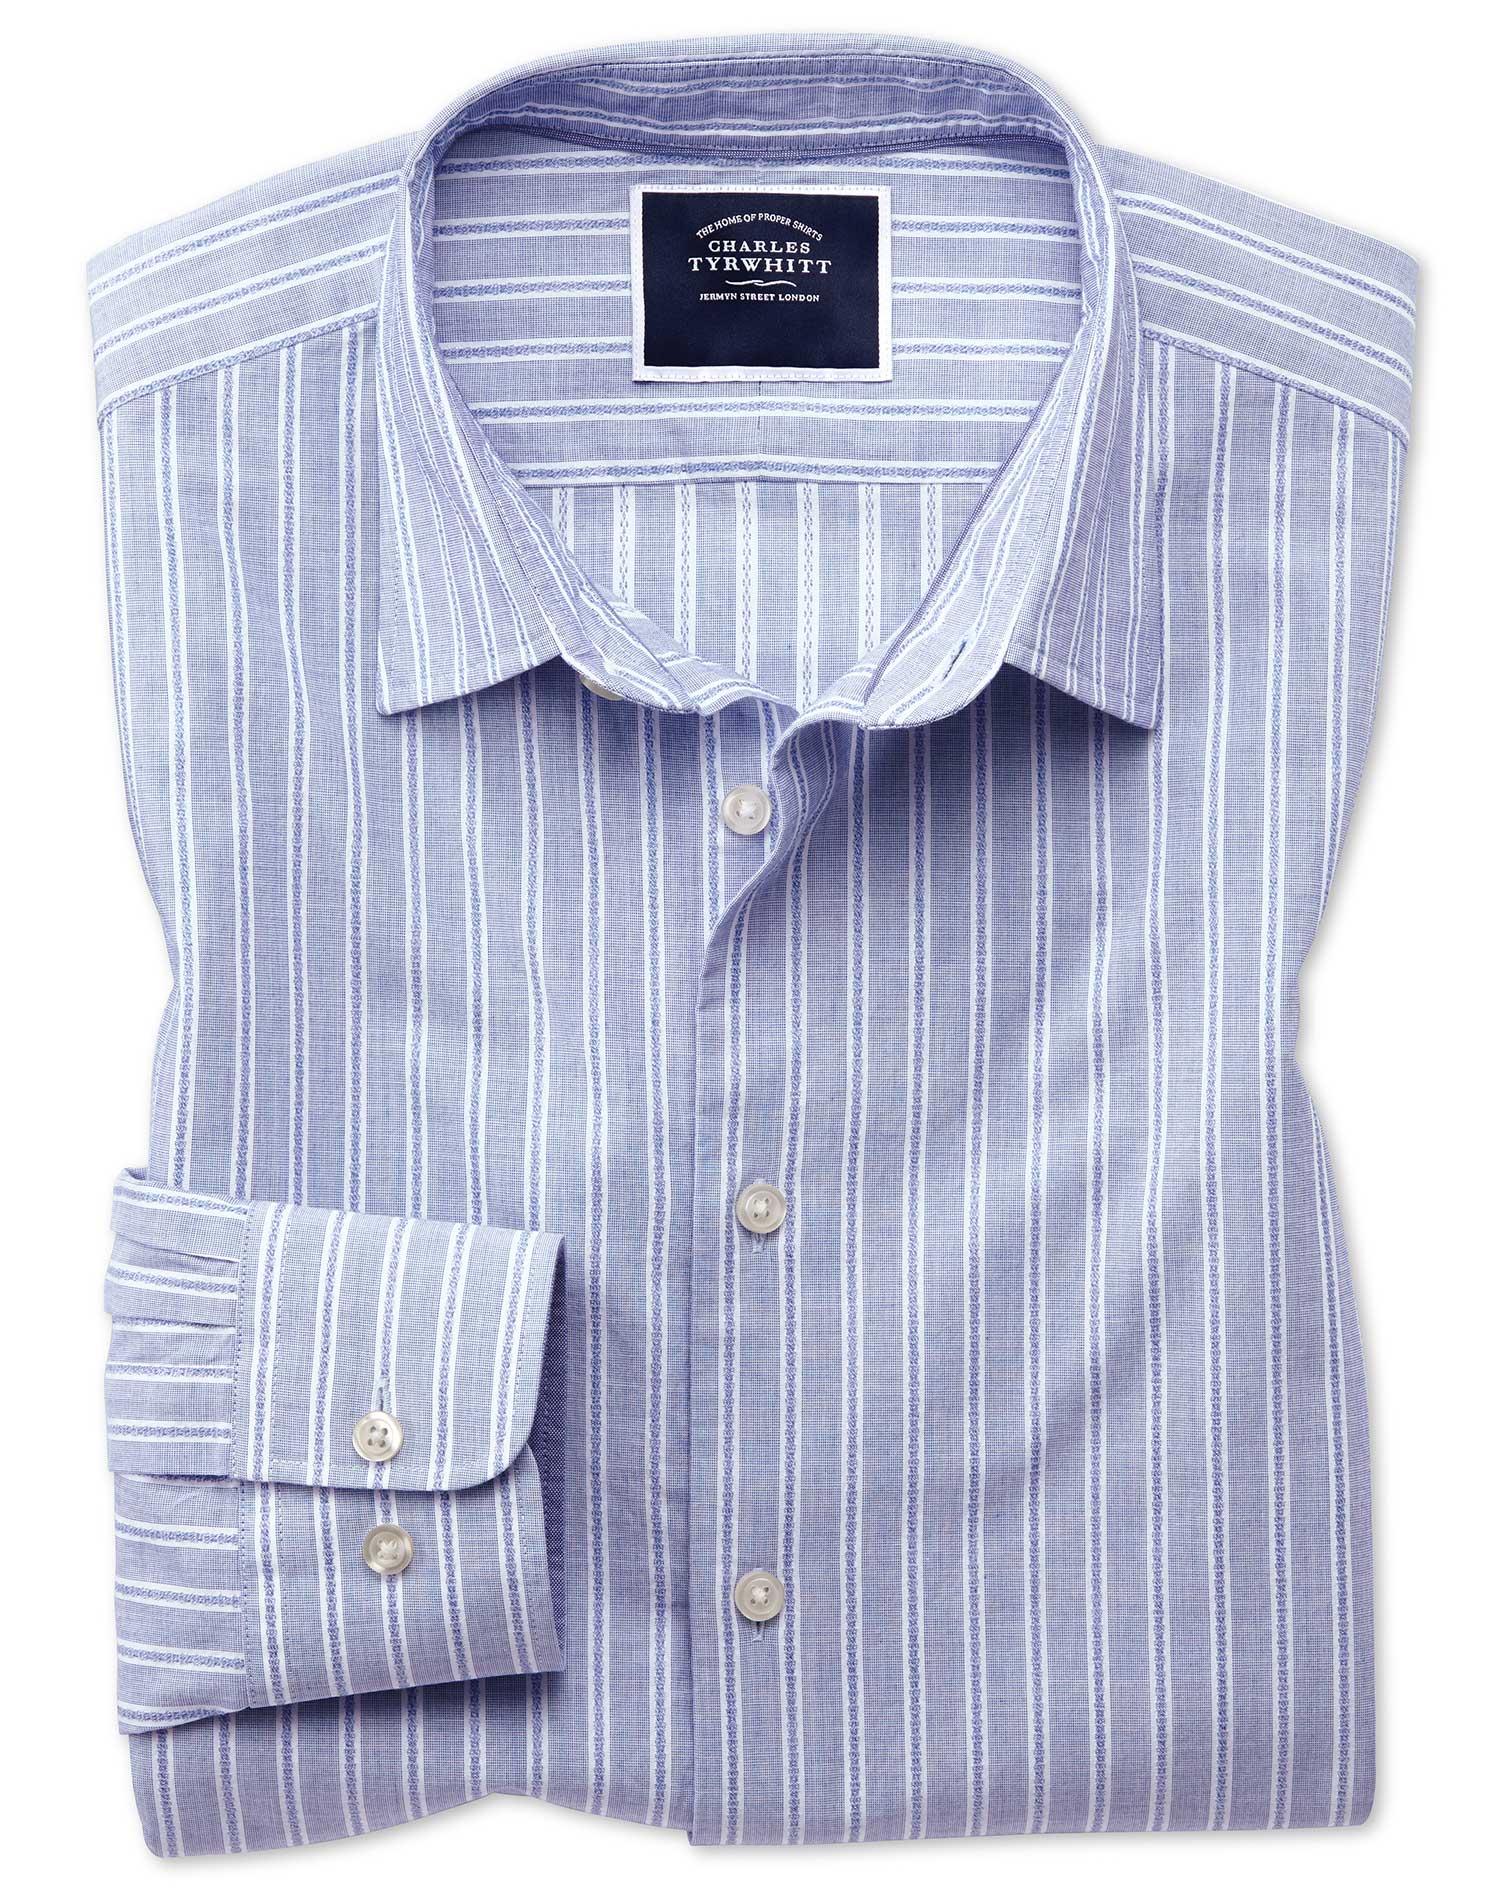 Slim Fit Blue and White Stripe Soft Texture Cotton Shirt Single Cuff Size Medium by Charles Tyrwhitt